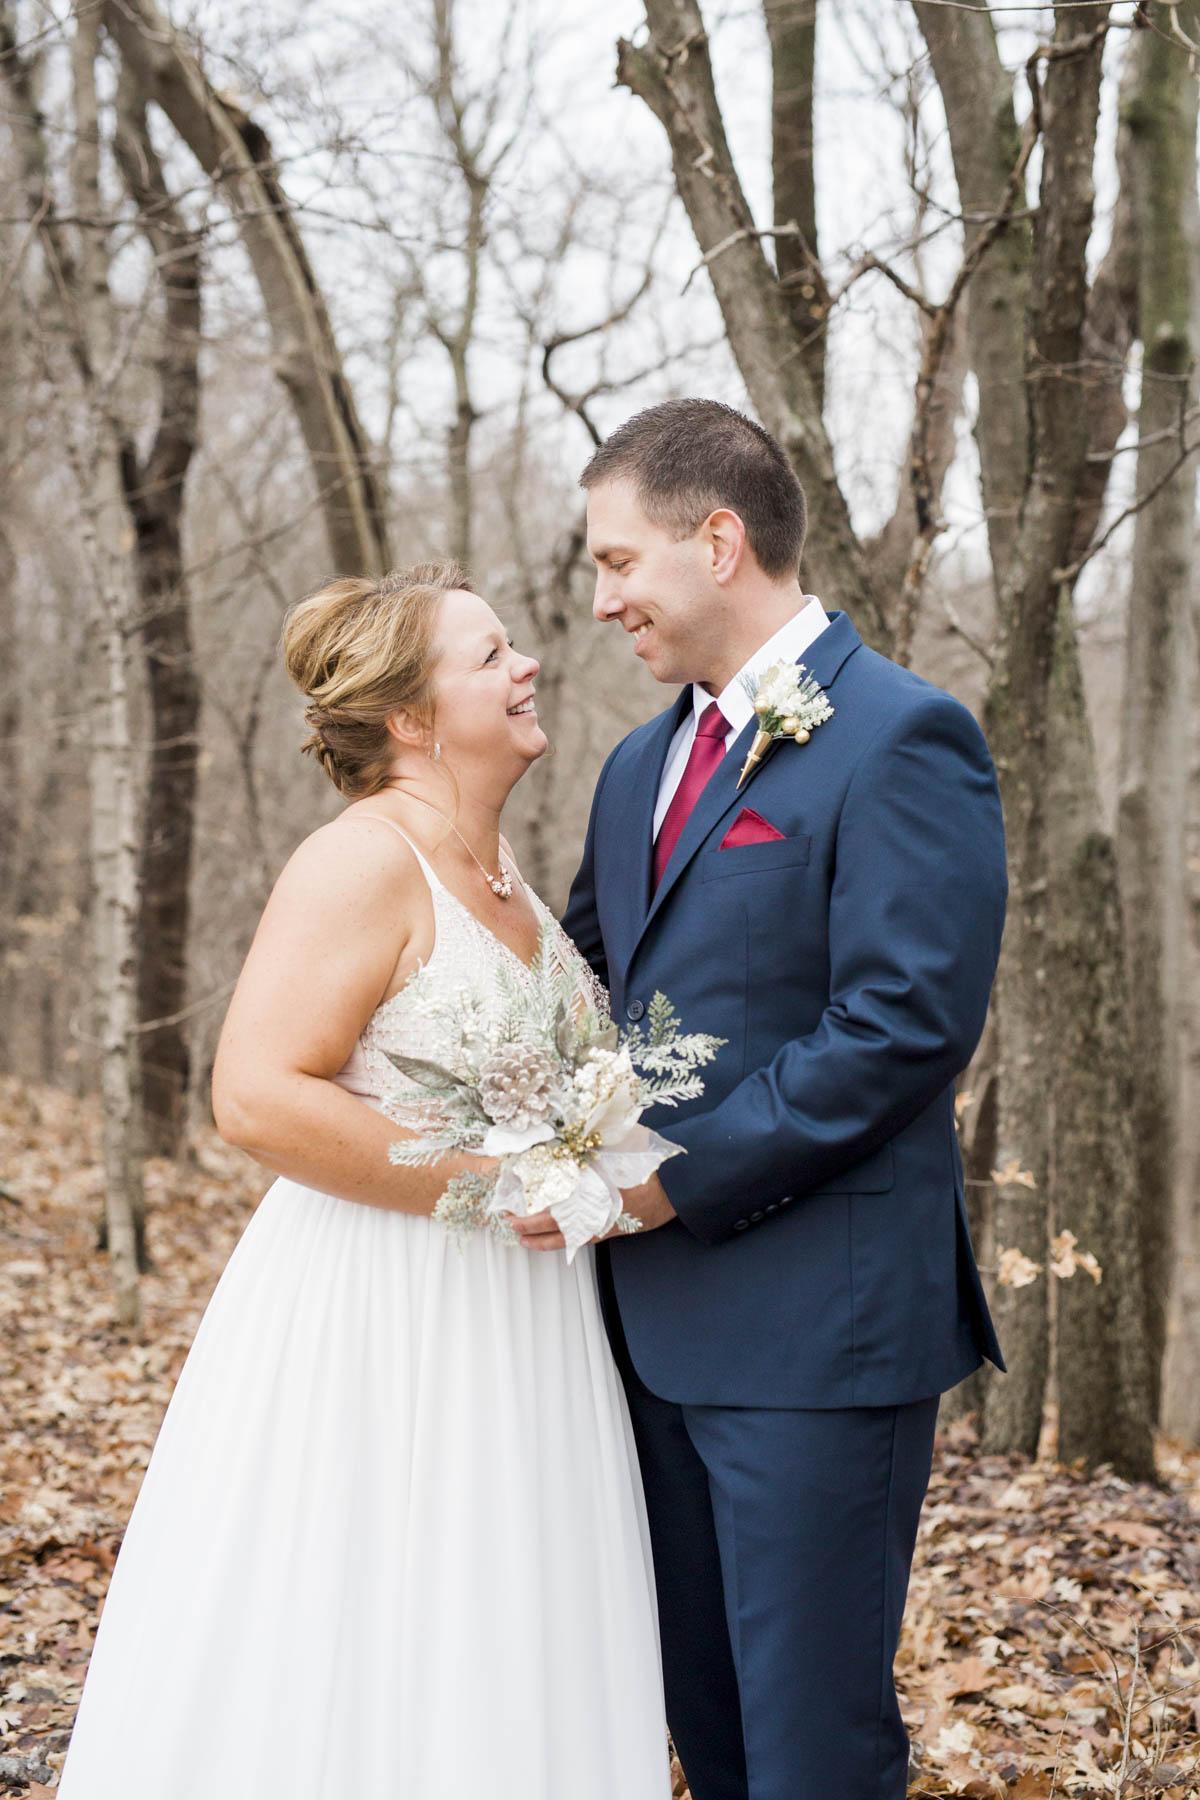 shotbychelsea_wedding_photography_blog-16.jpg